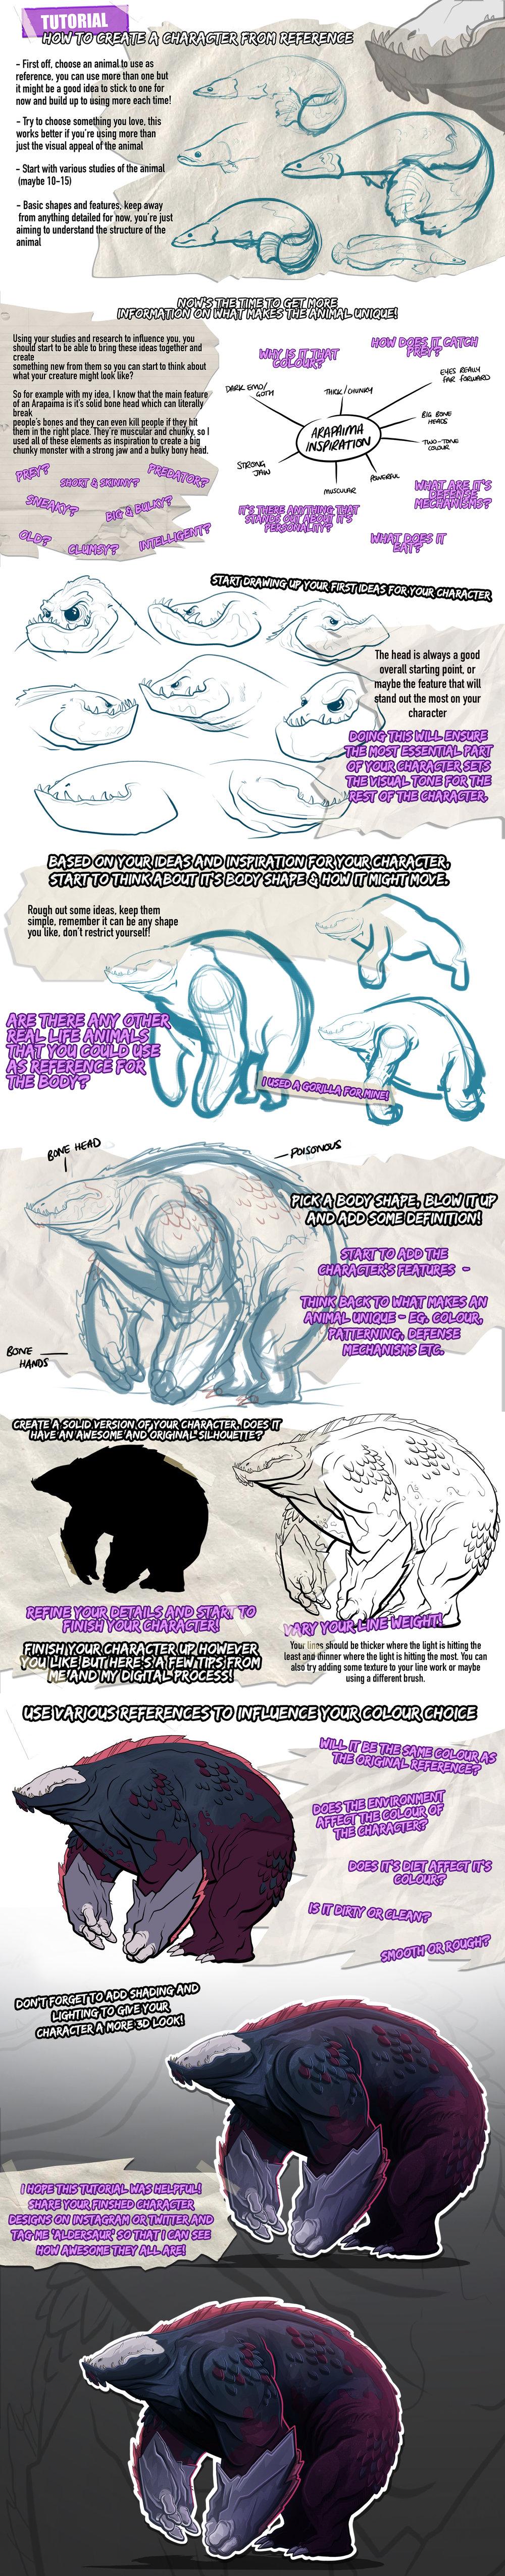 bone_head_tutorial_final.jpg